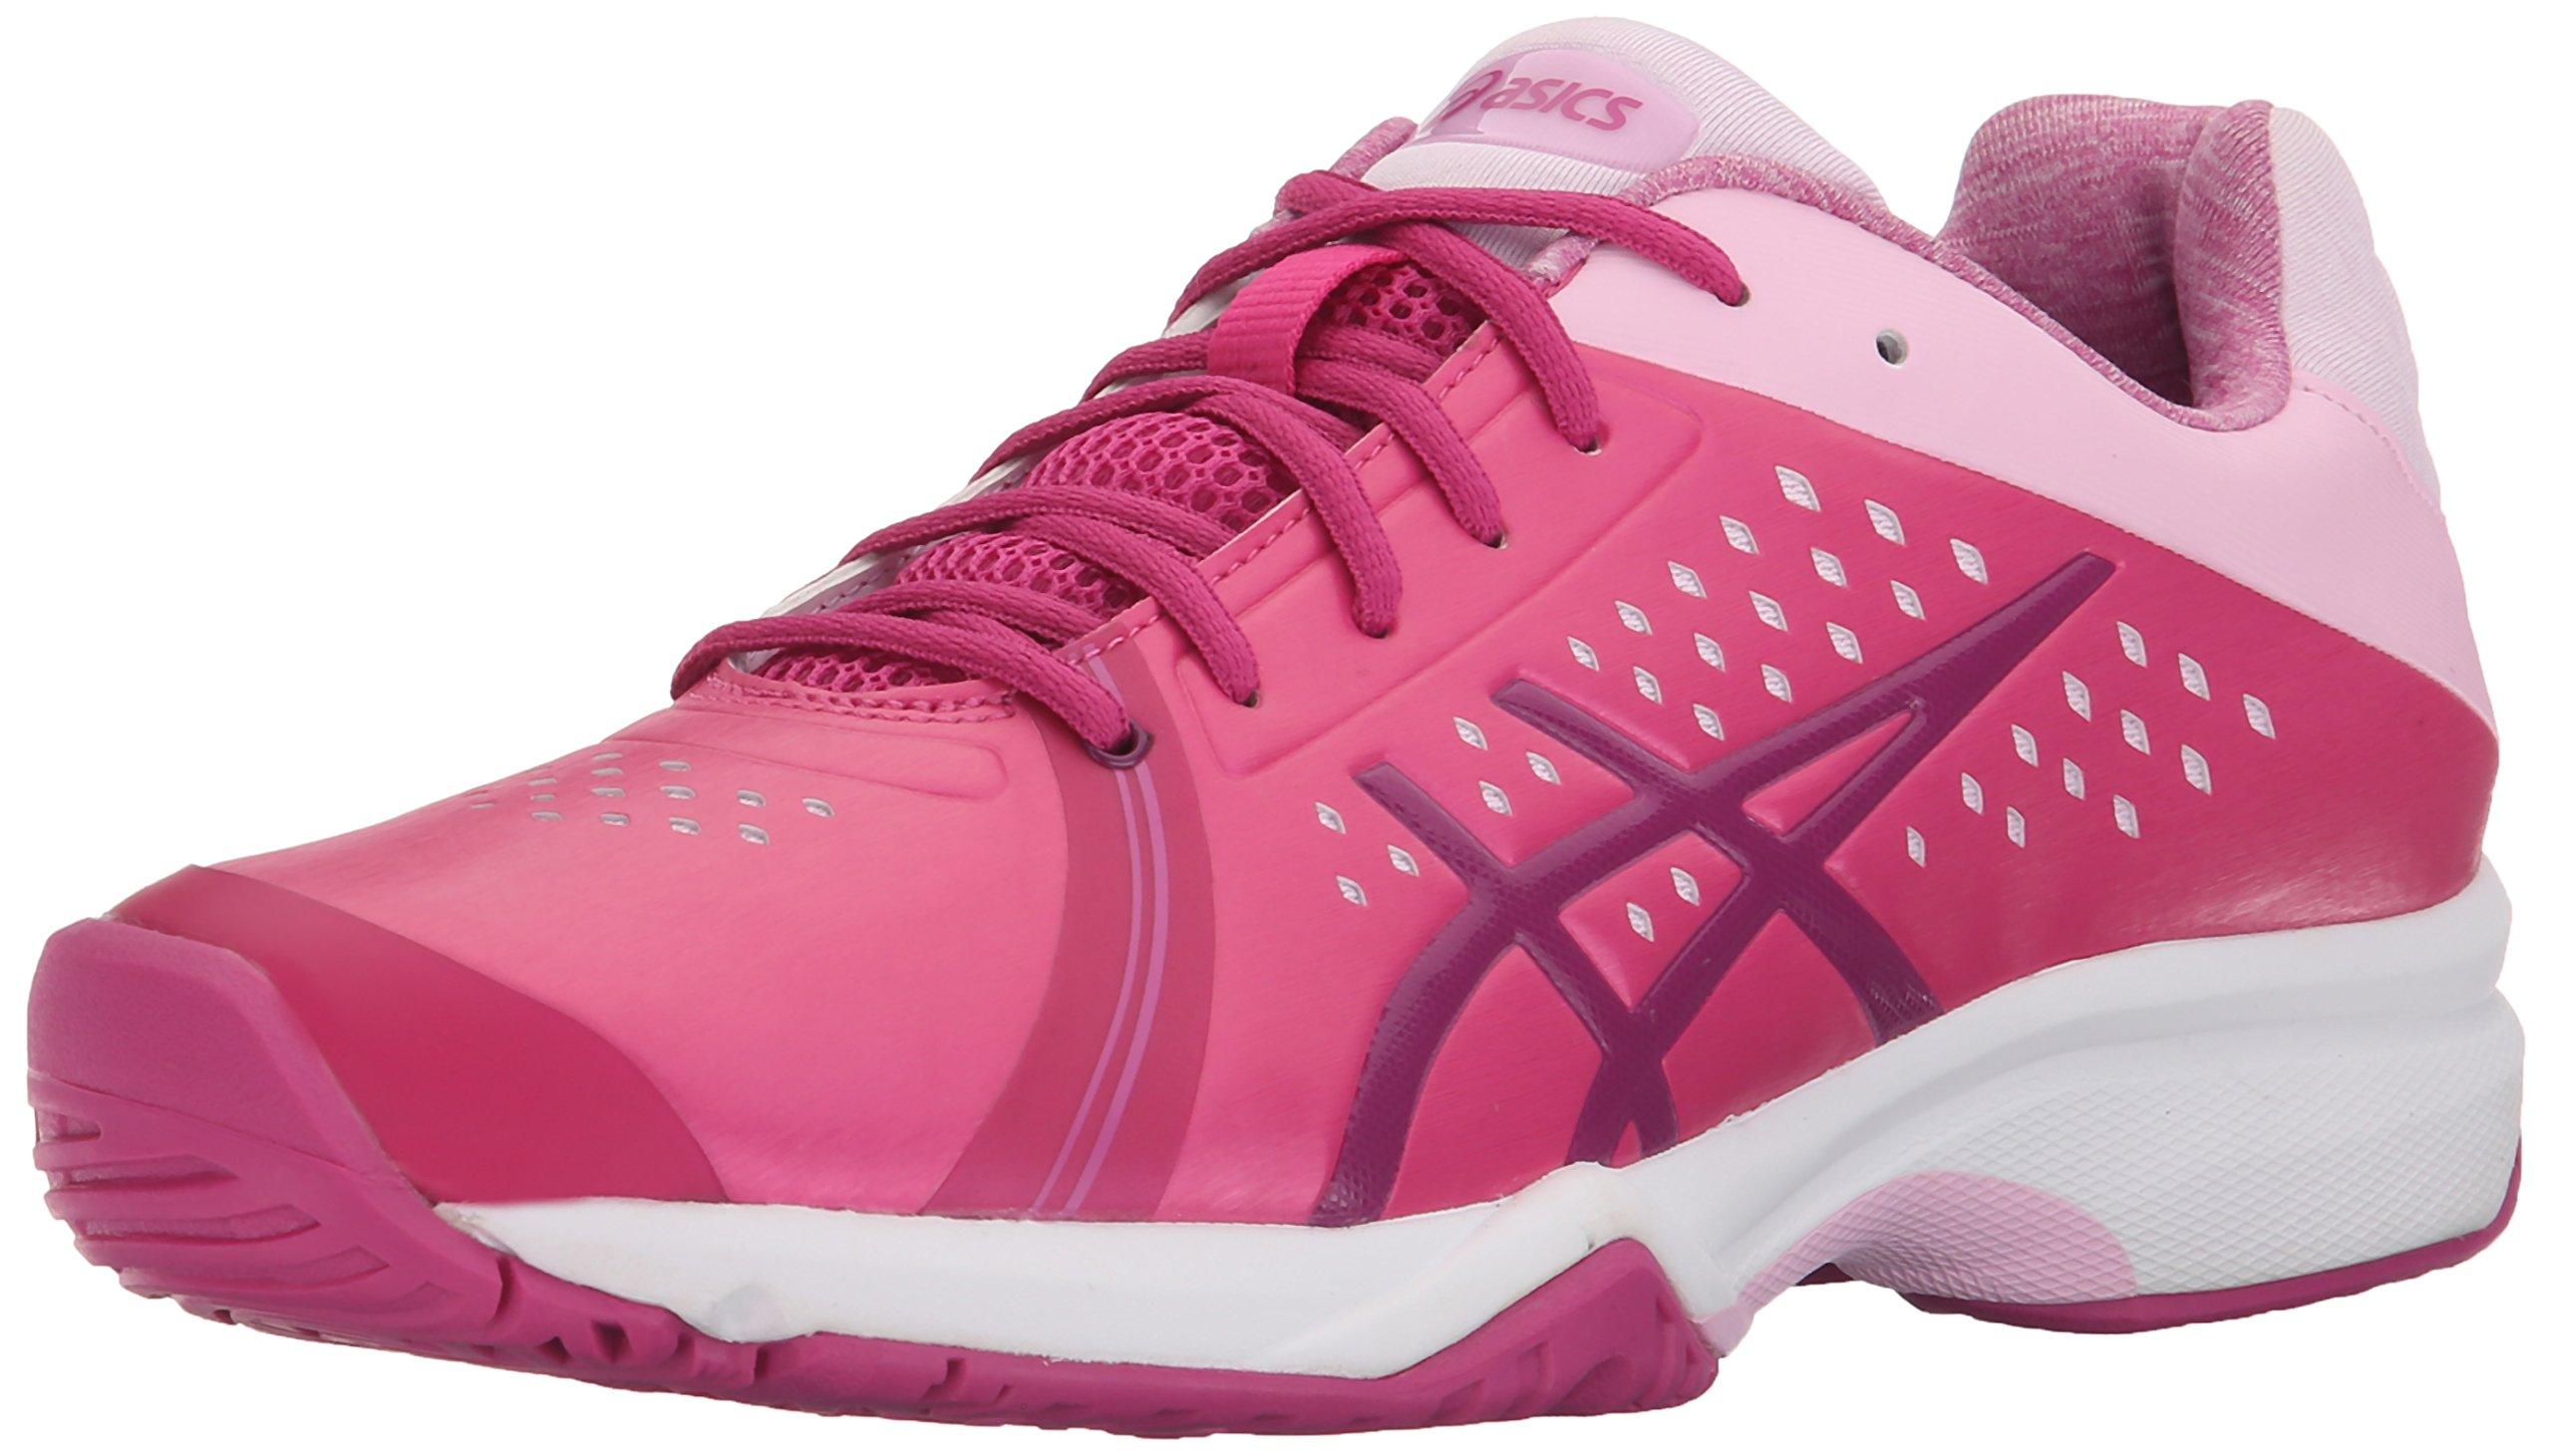 ASICS Women's GEL-Court Bella Tennis Shoe, Berry/Plum/Cotton Candy, 12 M US